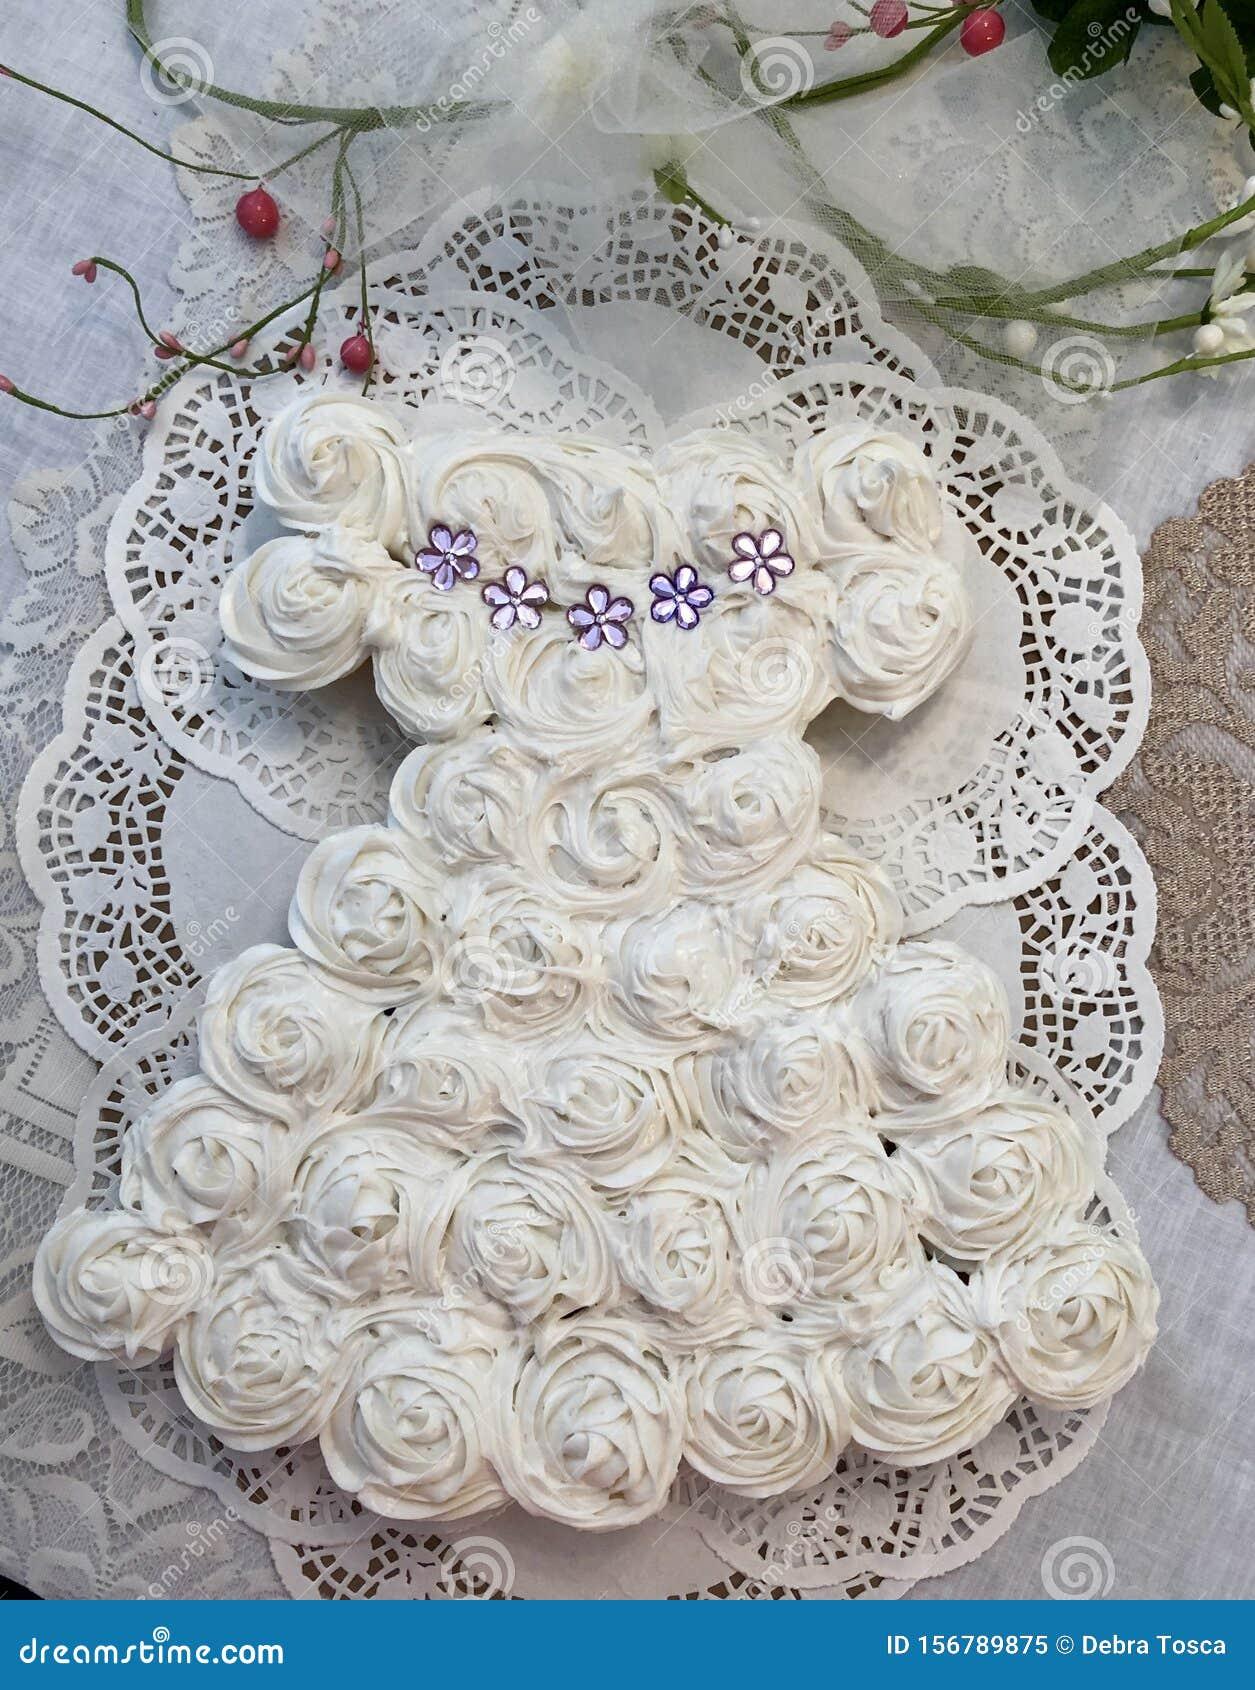 4 719 Dress Wedding Cake Photos Free Royalty Free Stock Photos From Dreamstime